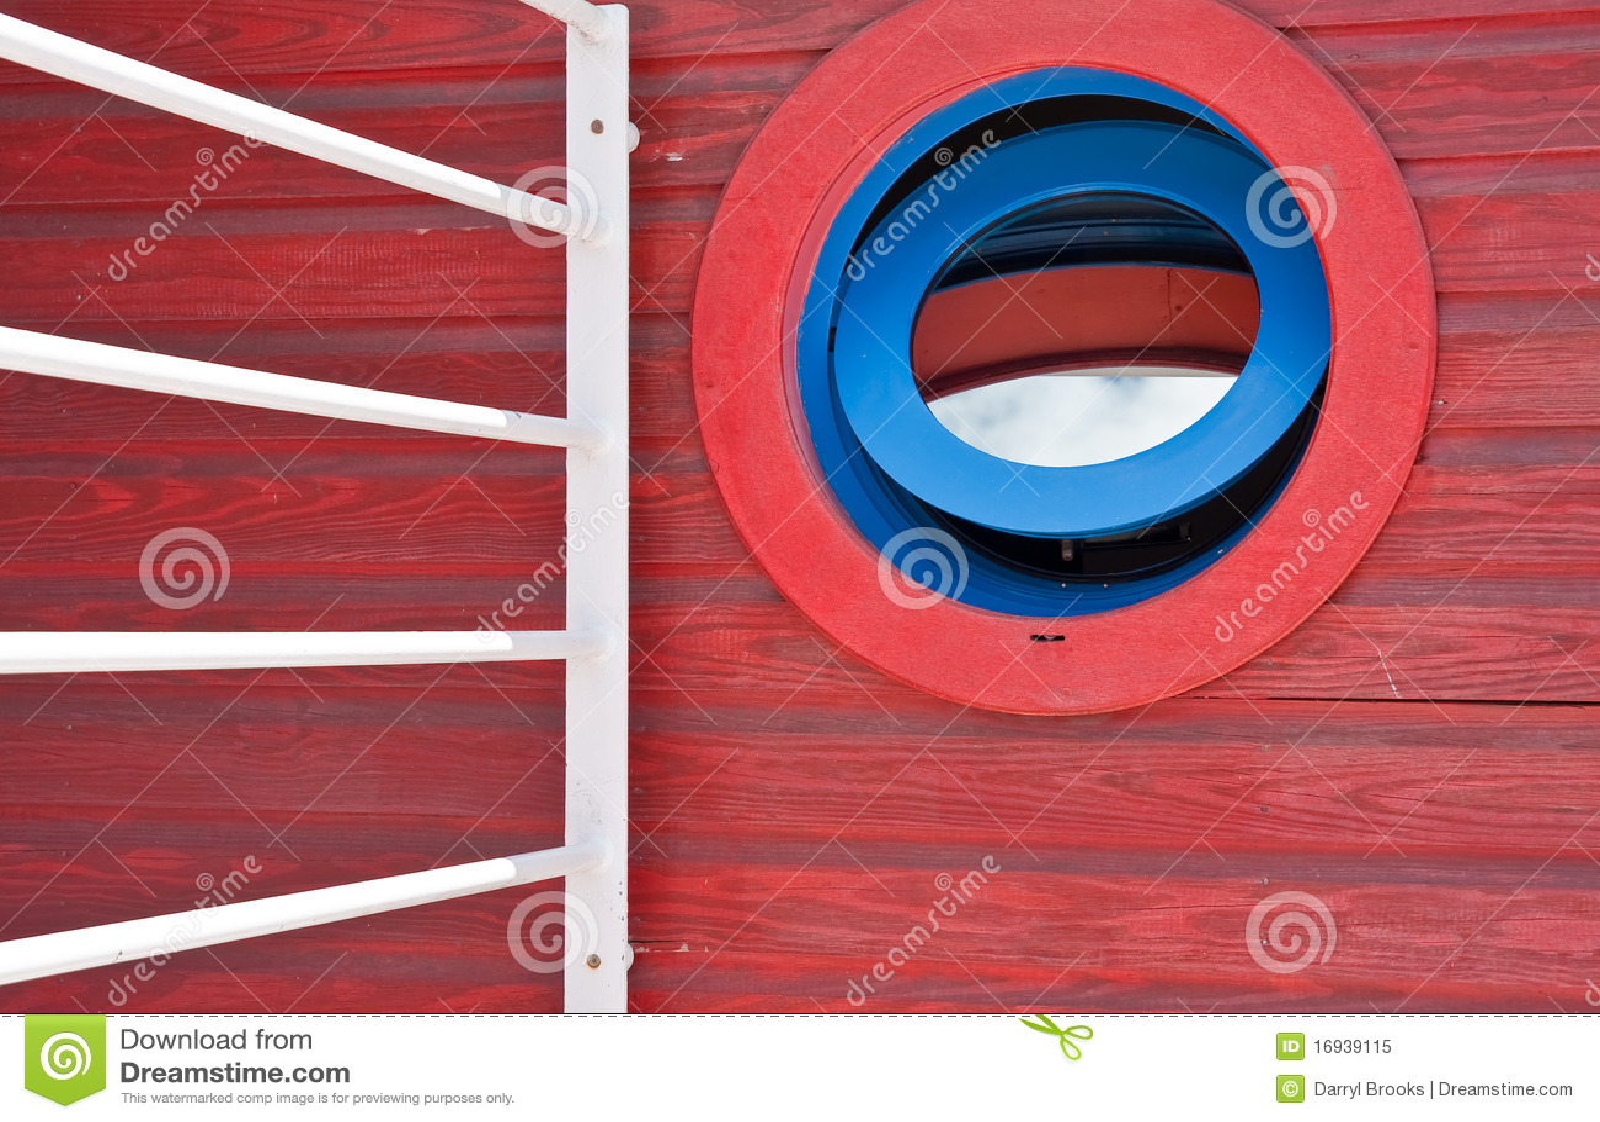 Finestra rotonda blu e rossa in una parete di legno rossa - Finestra ovale e finestra rotonda ...